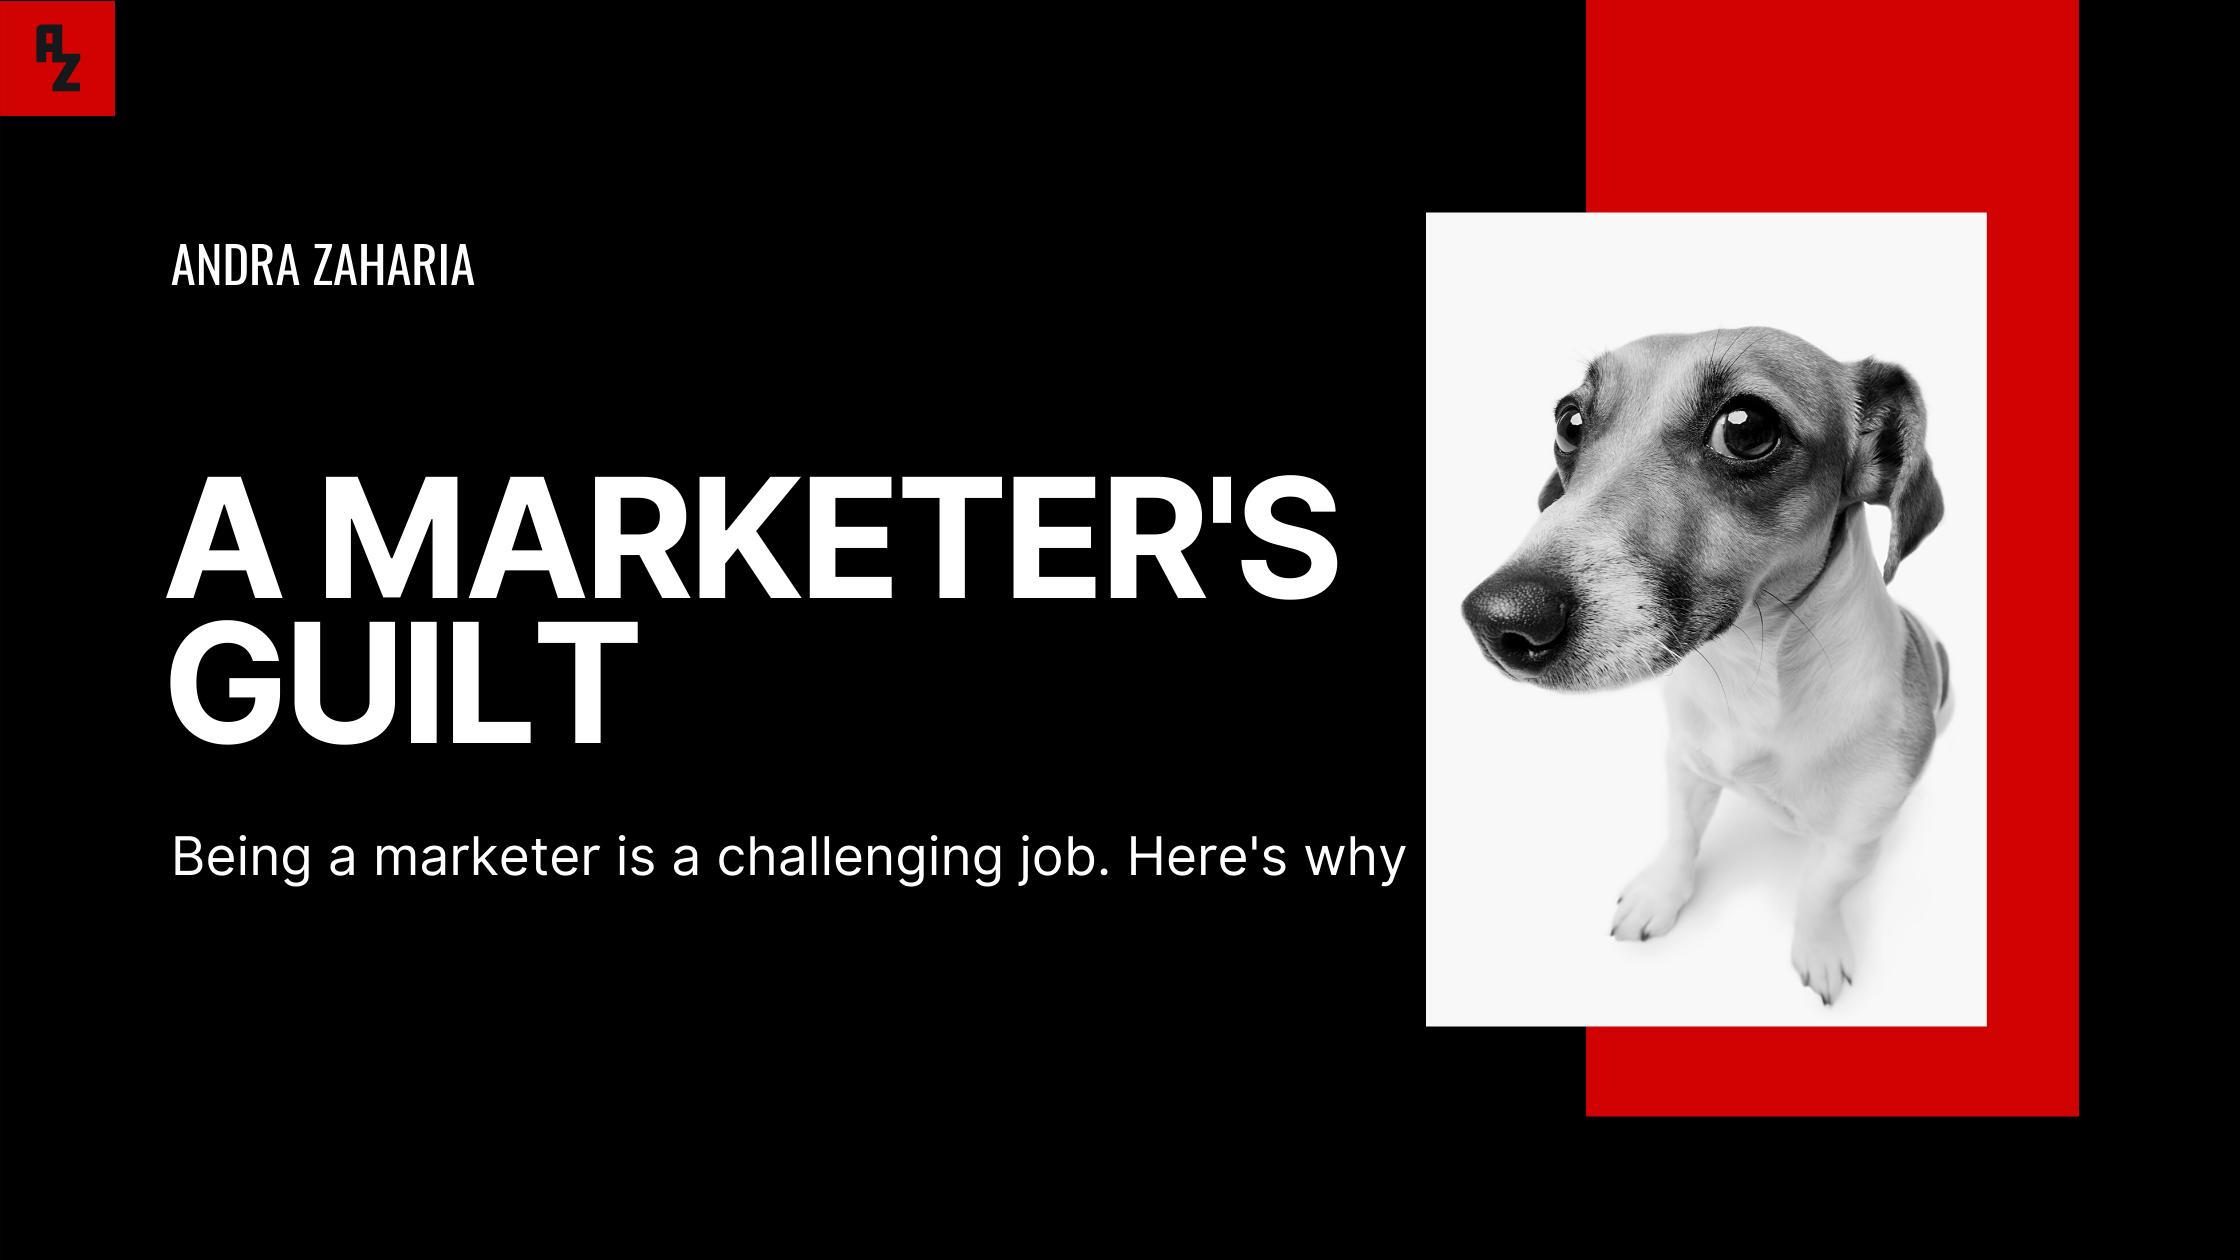 marketers' guilt